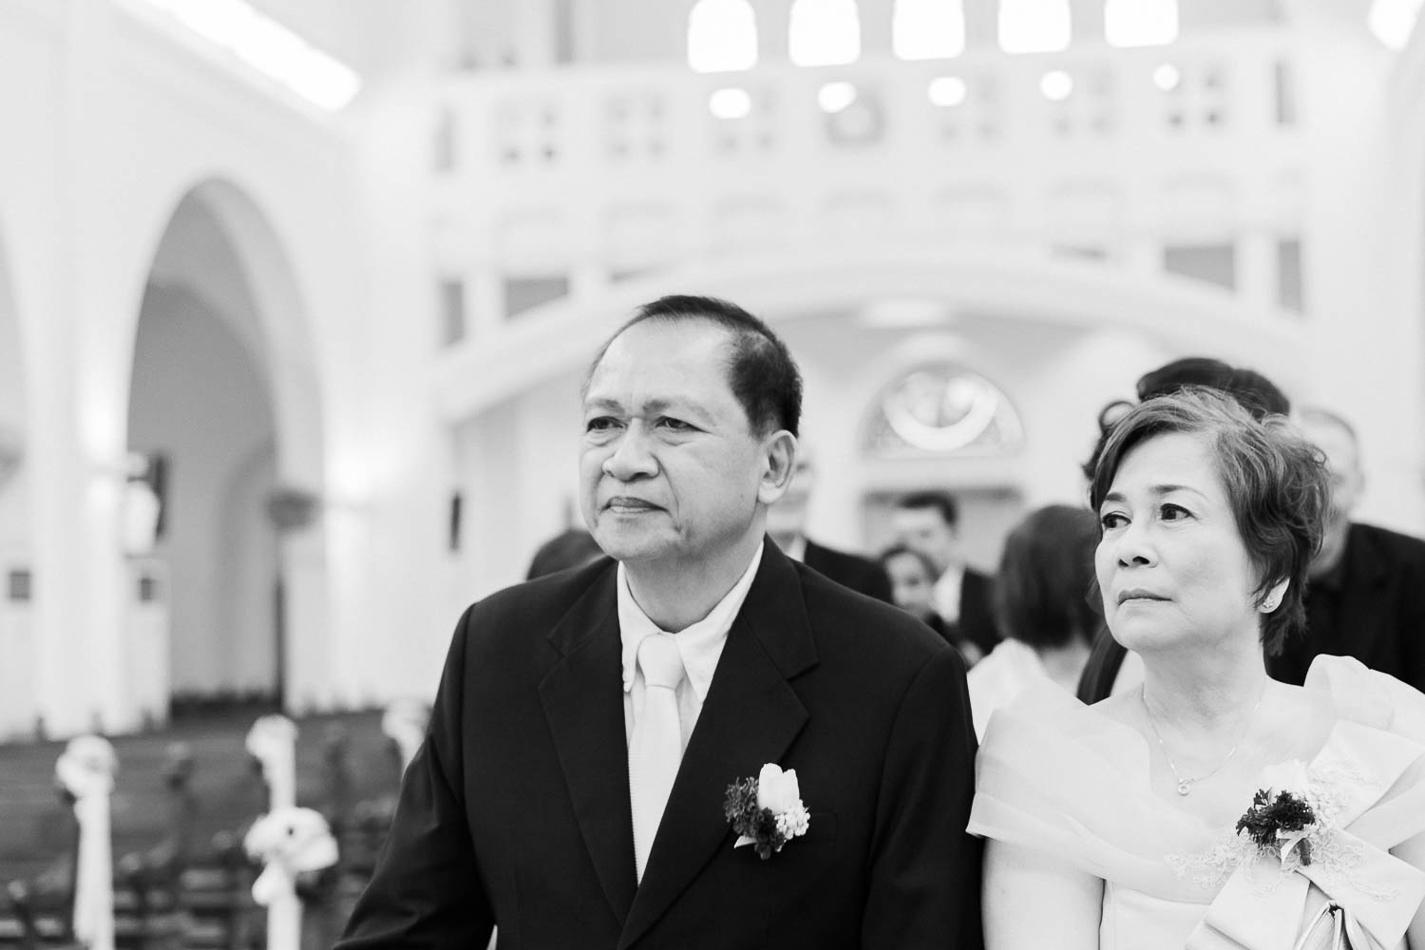 wedding-photographer-singapore-film-photographer-chen-sands-Anglea-wedding-CSPBLOG-11.jpg